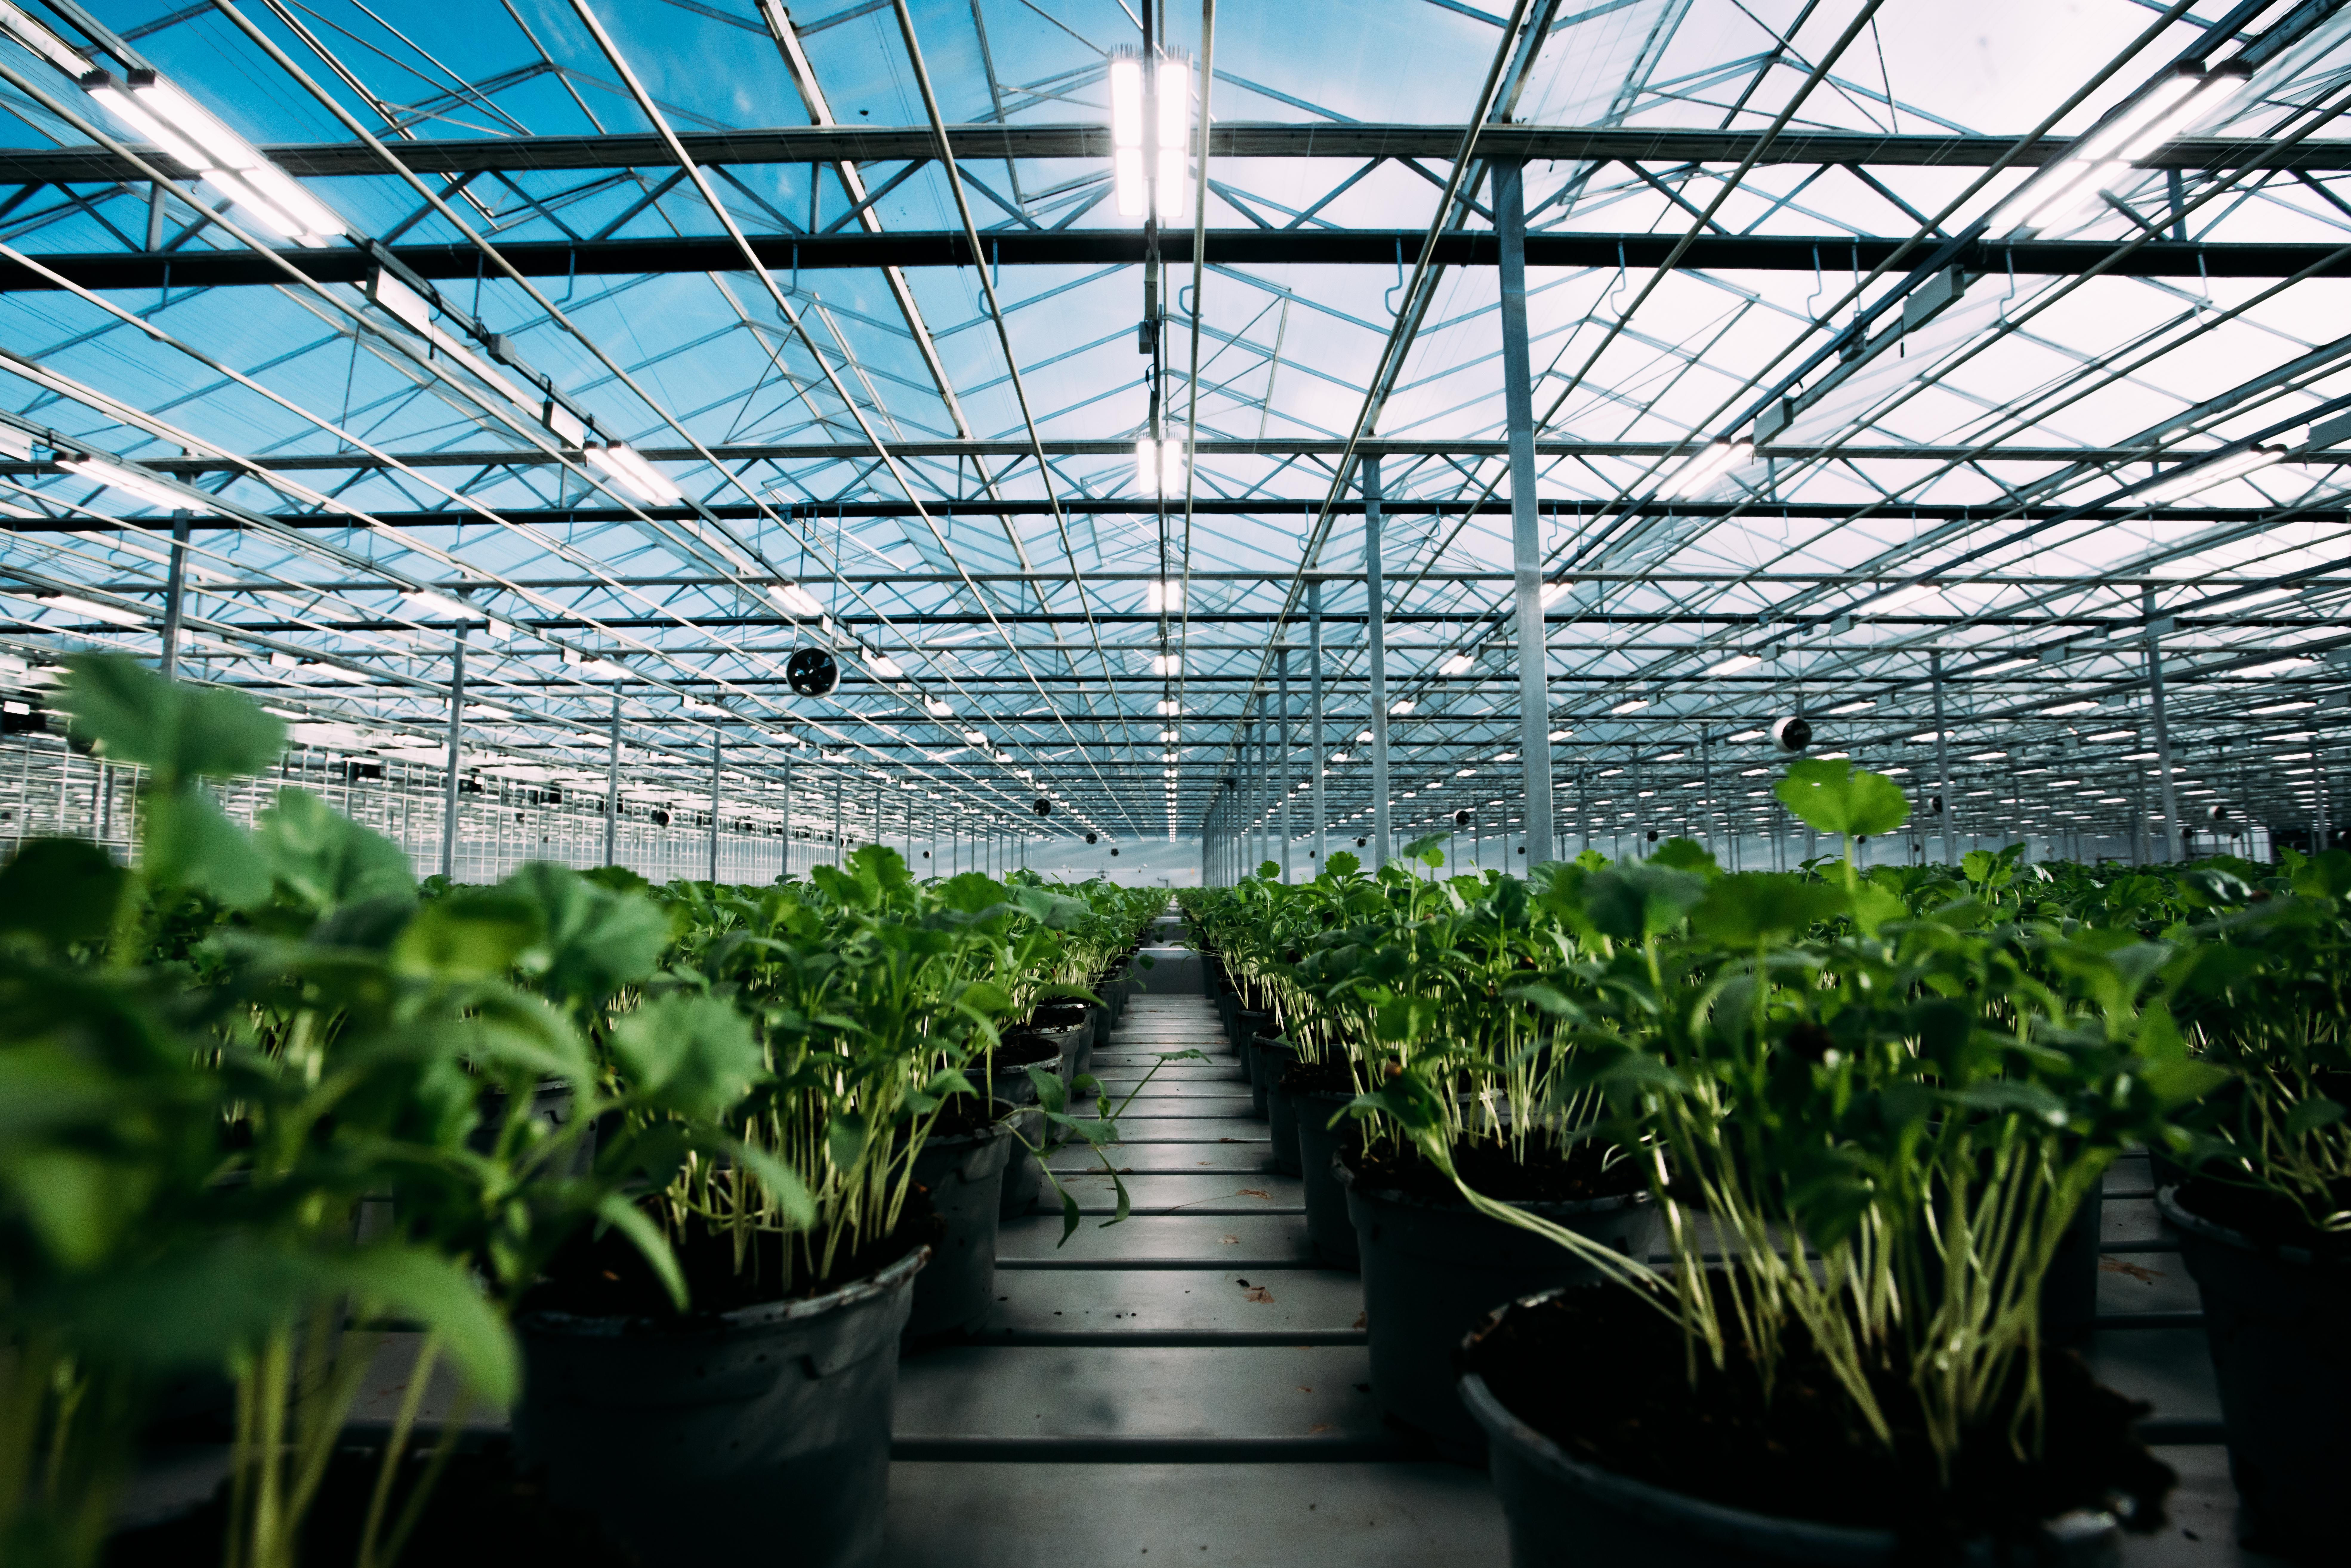 Bridge Farm Group Greenhouse